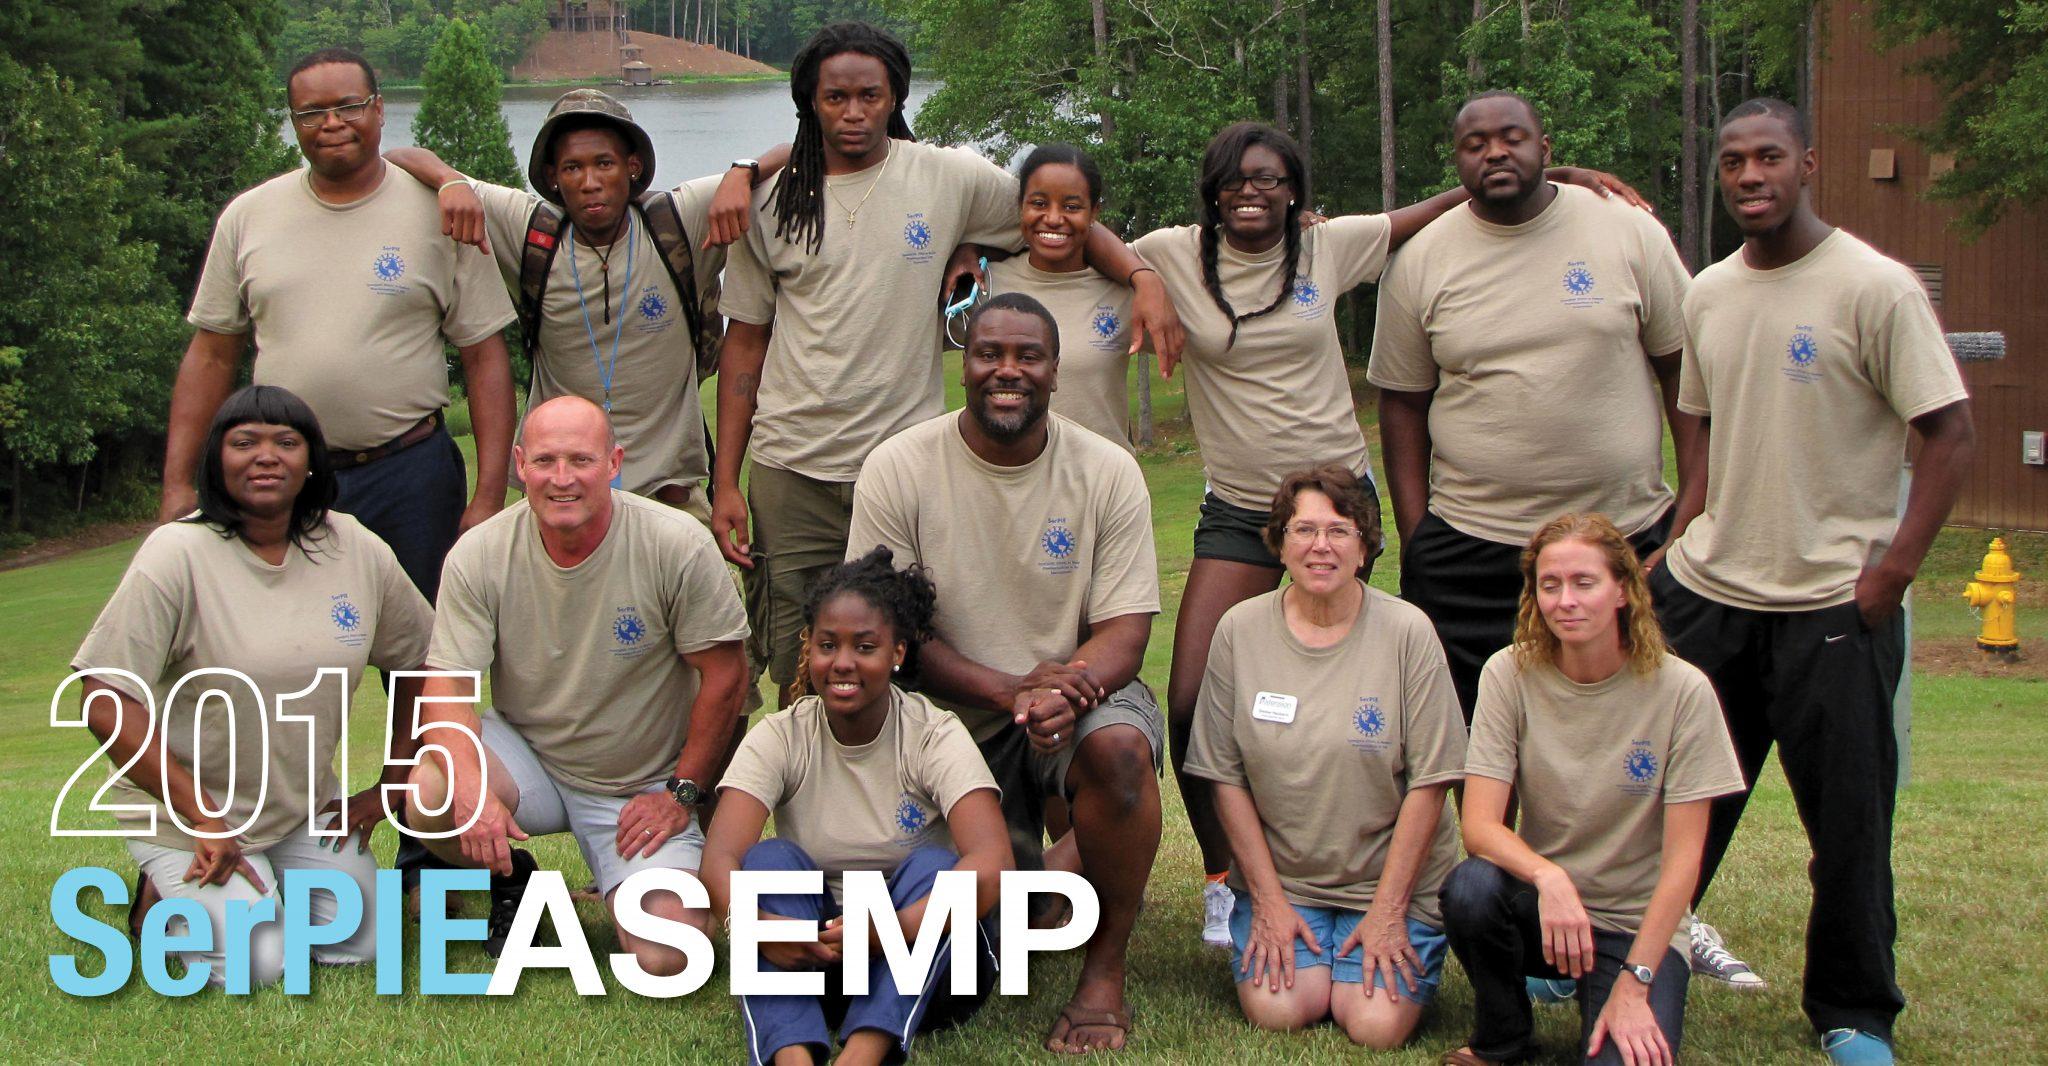 Group Picture of 2015 SerPIE ASEMP Participants